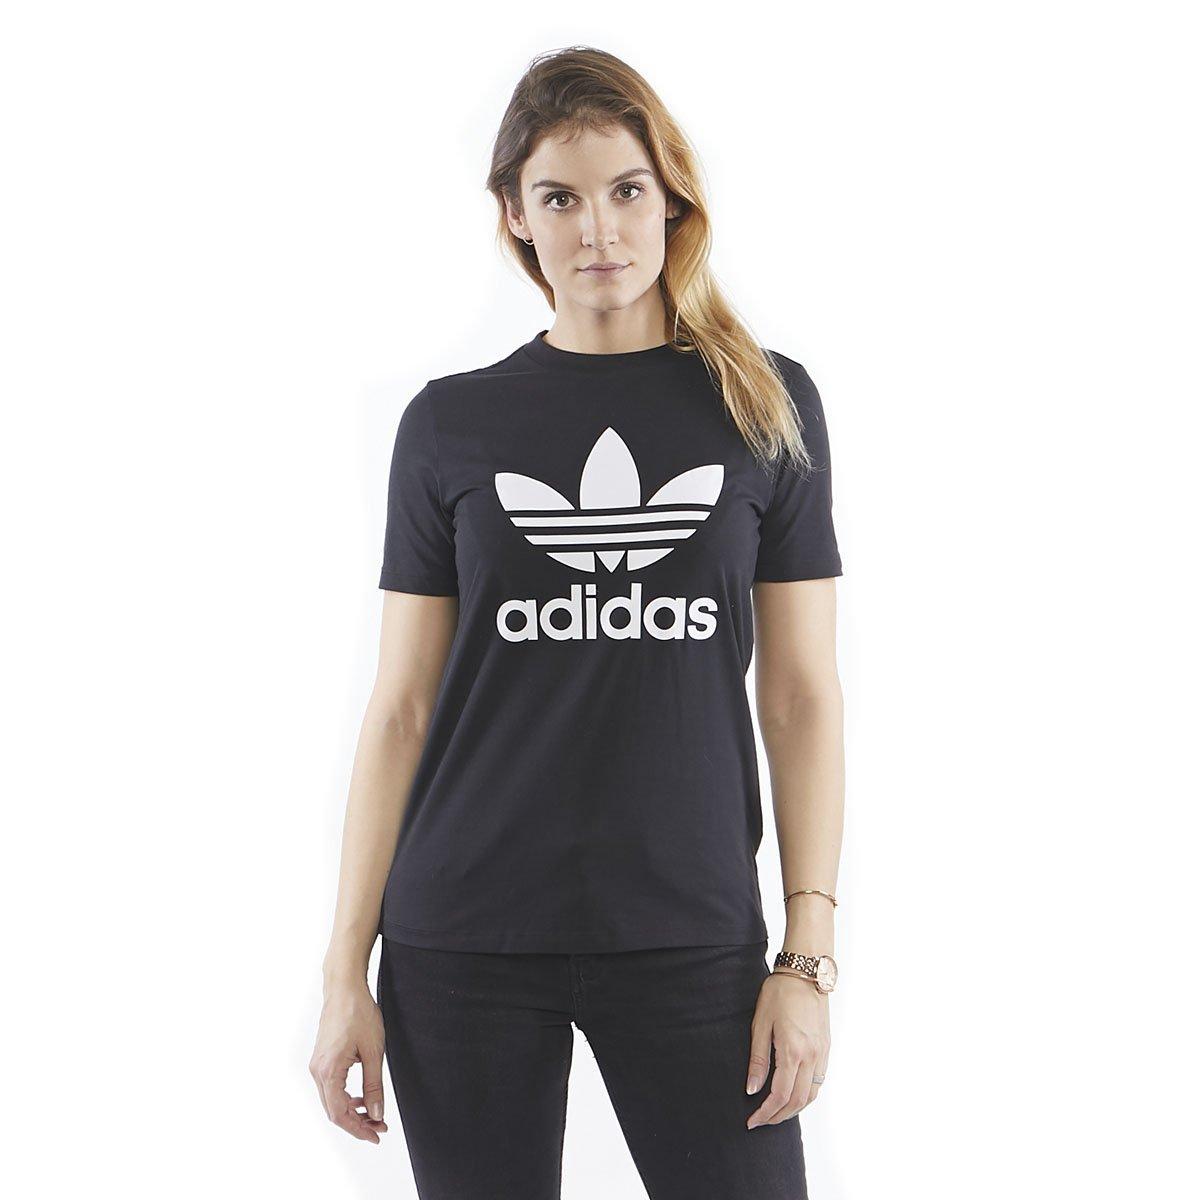 Koszulka damska Adidas Originals Trefoil Tee blackwhite